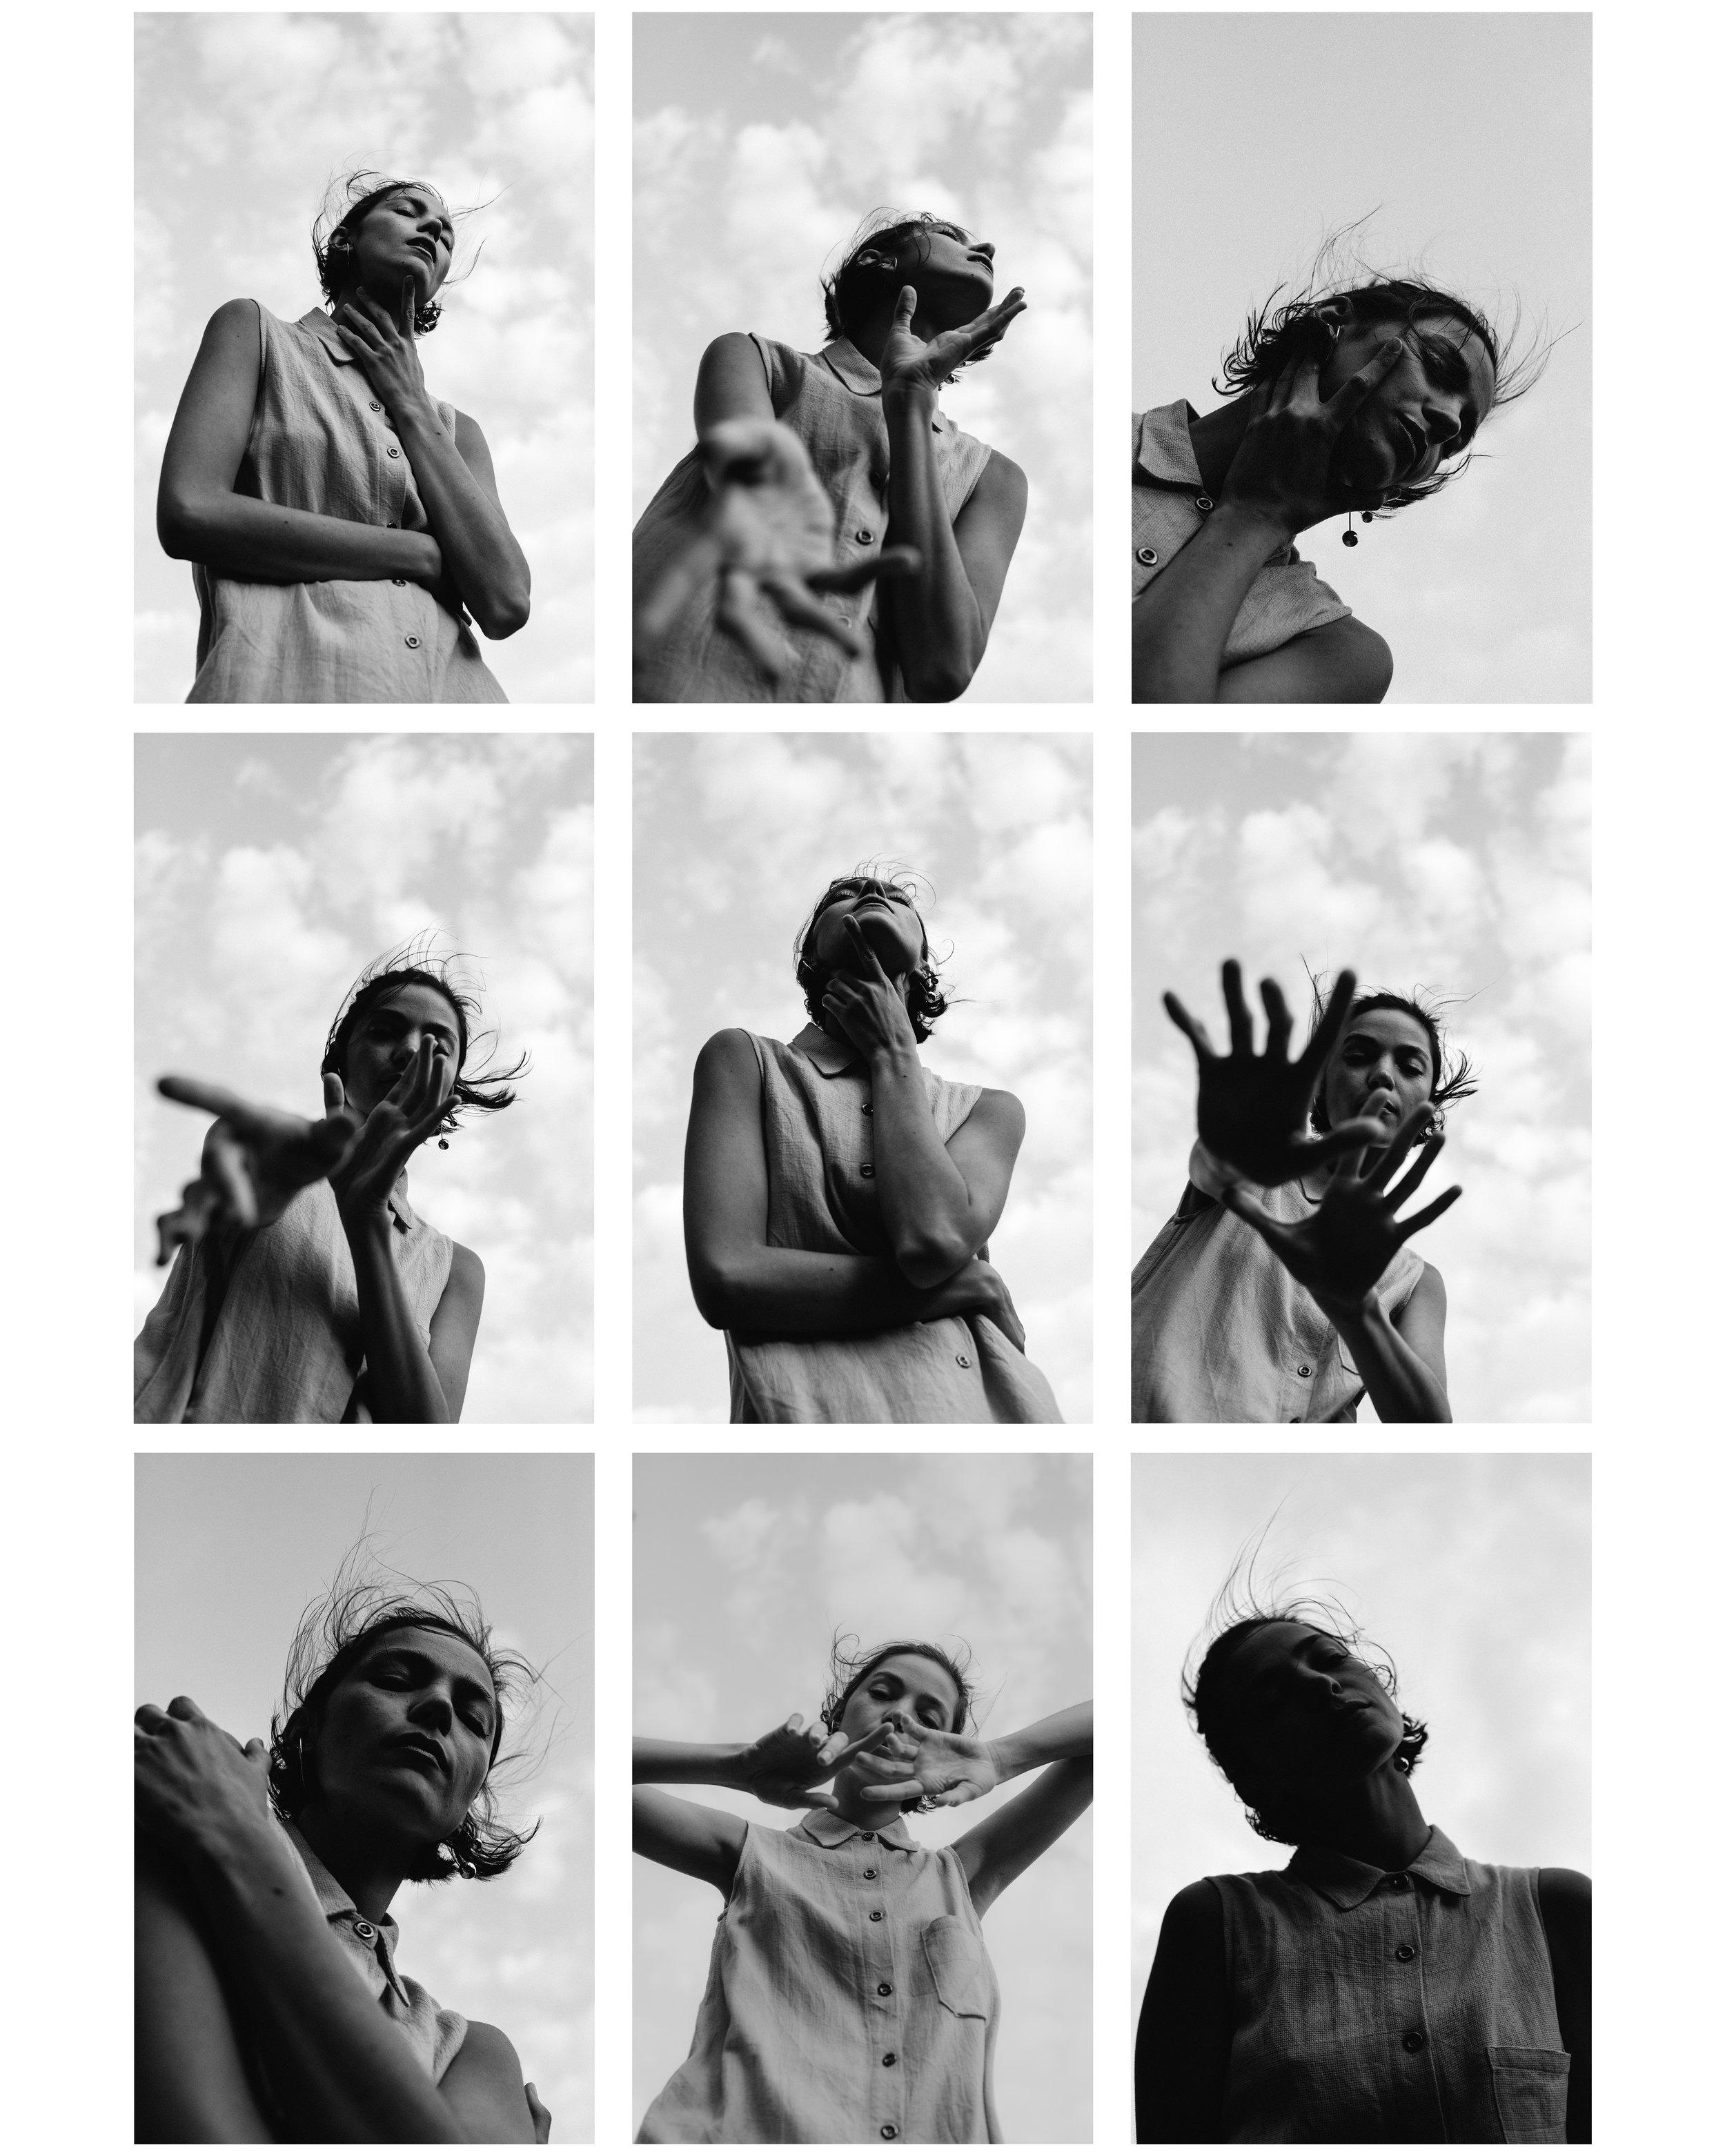 Nata.Collage.jpg